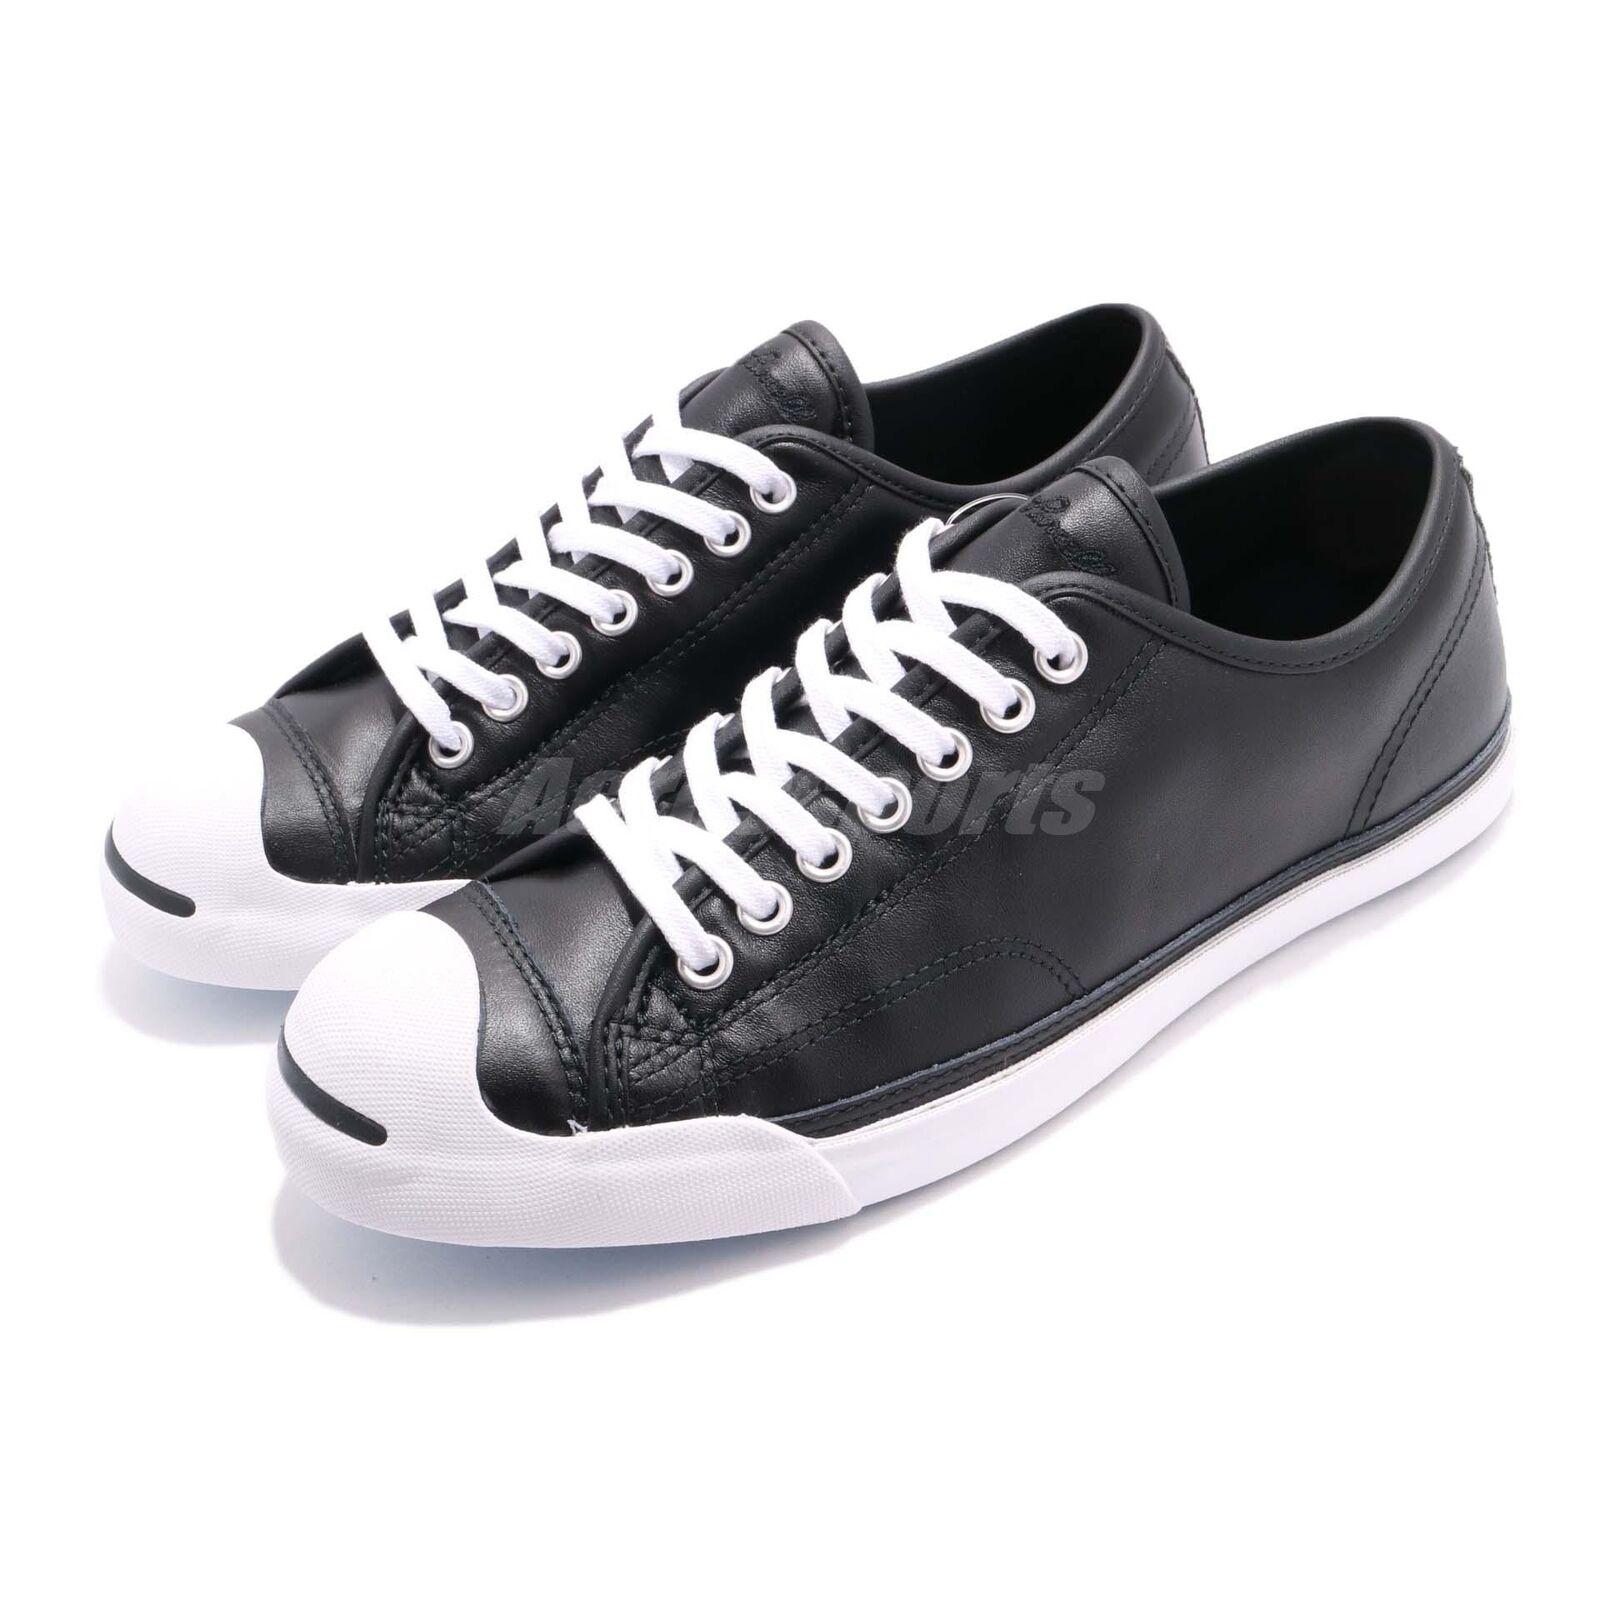 Converse Jack Classic Purcell LP L/S Low Hombre Classic Jack Zapatos Sneakers 158865C 2fc27e